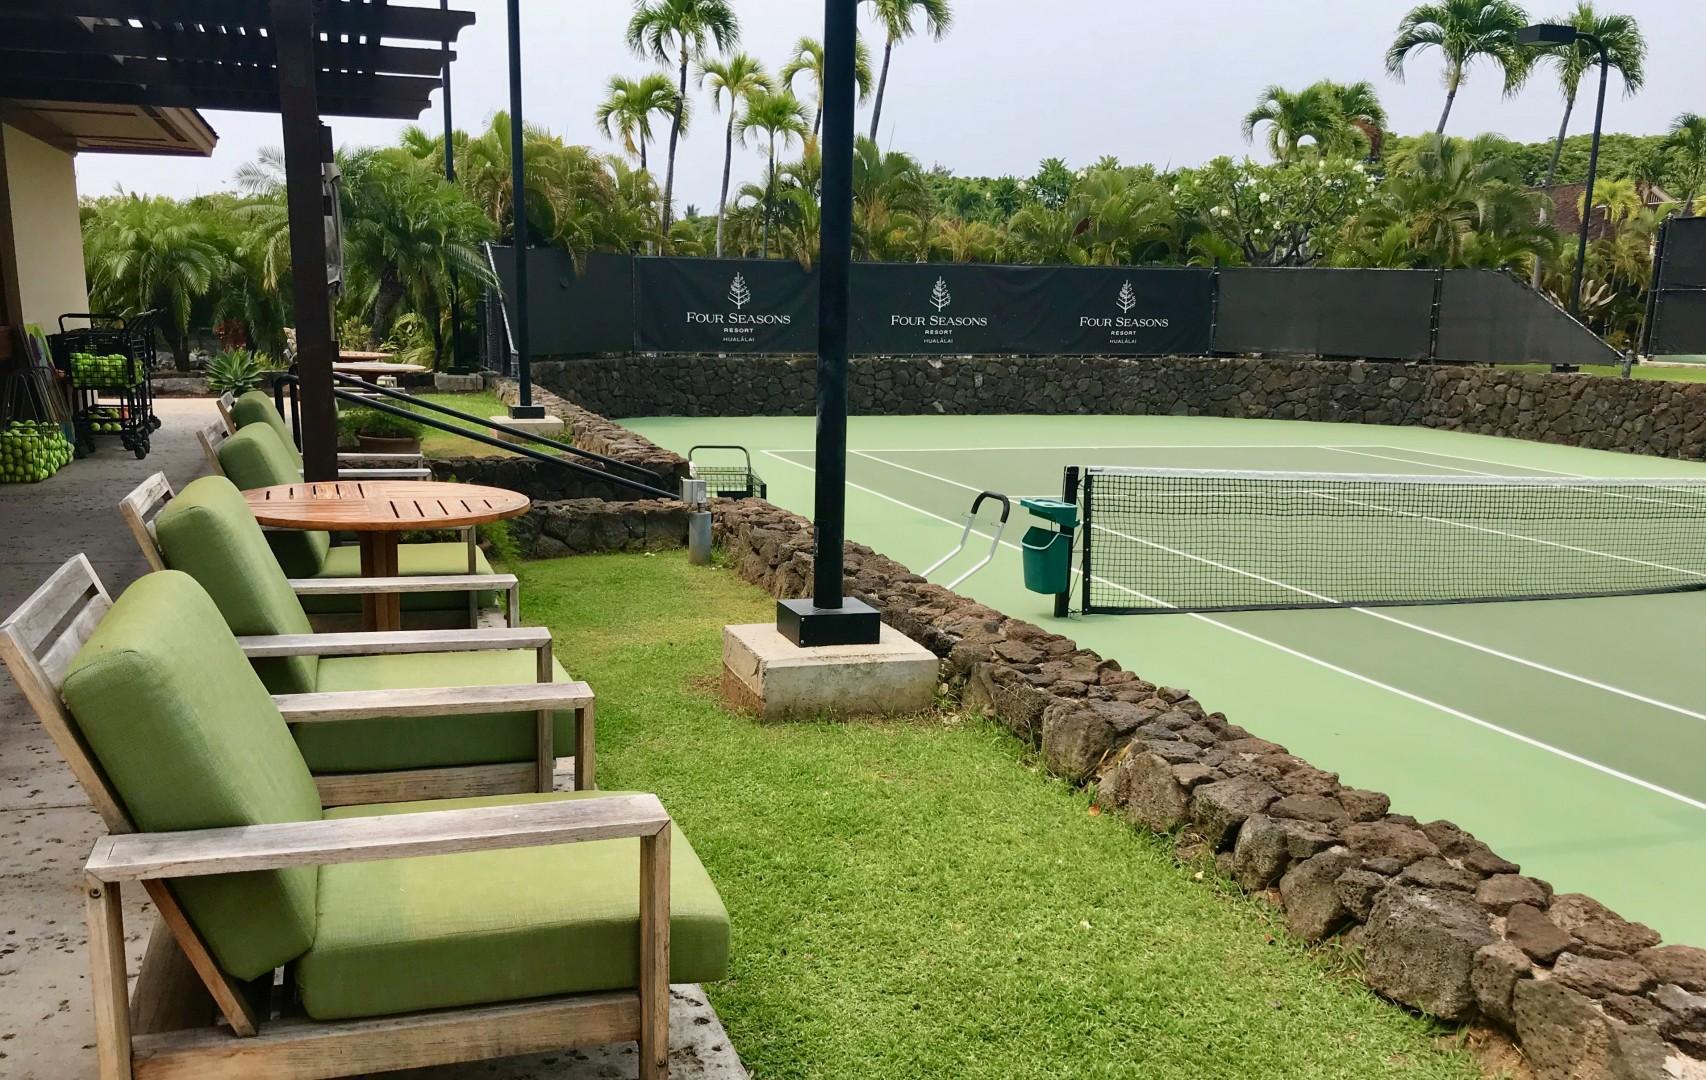 Four Seasons Resort Tennis Courts.